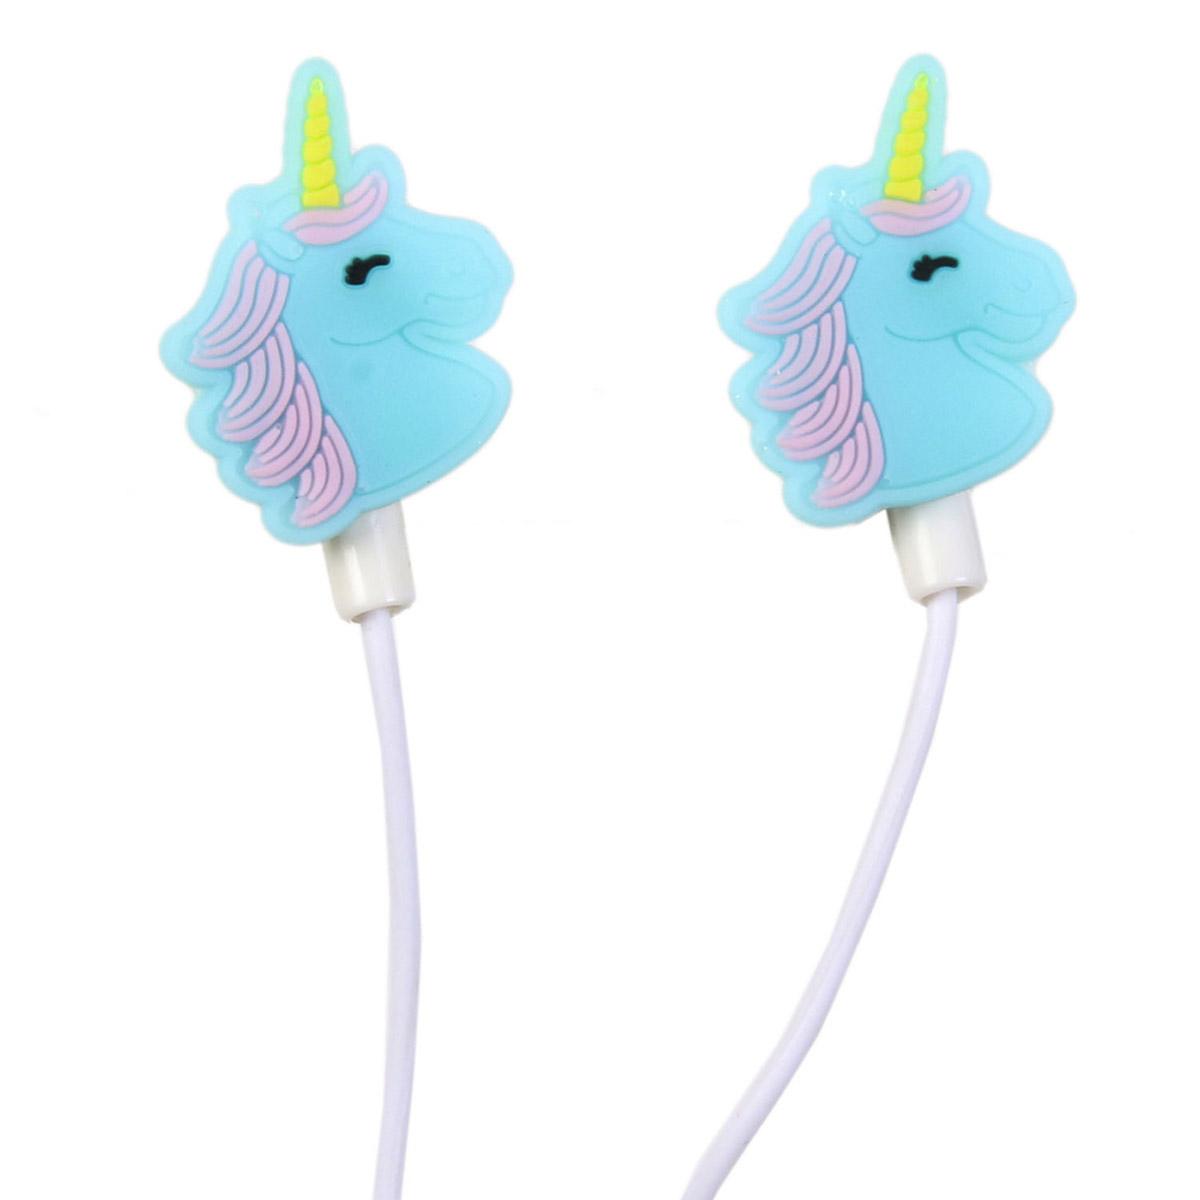 Ecouteurs \'Licorne My Unicorn\' bleu - 25x15 mm - [R2418]